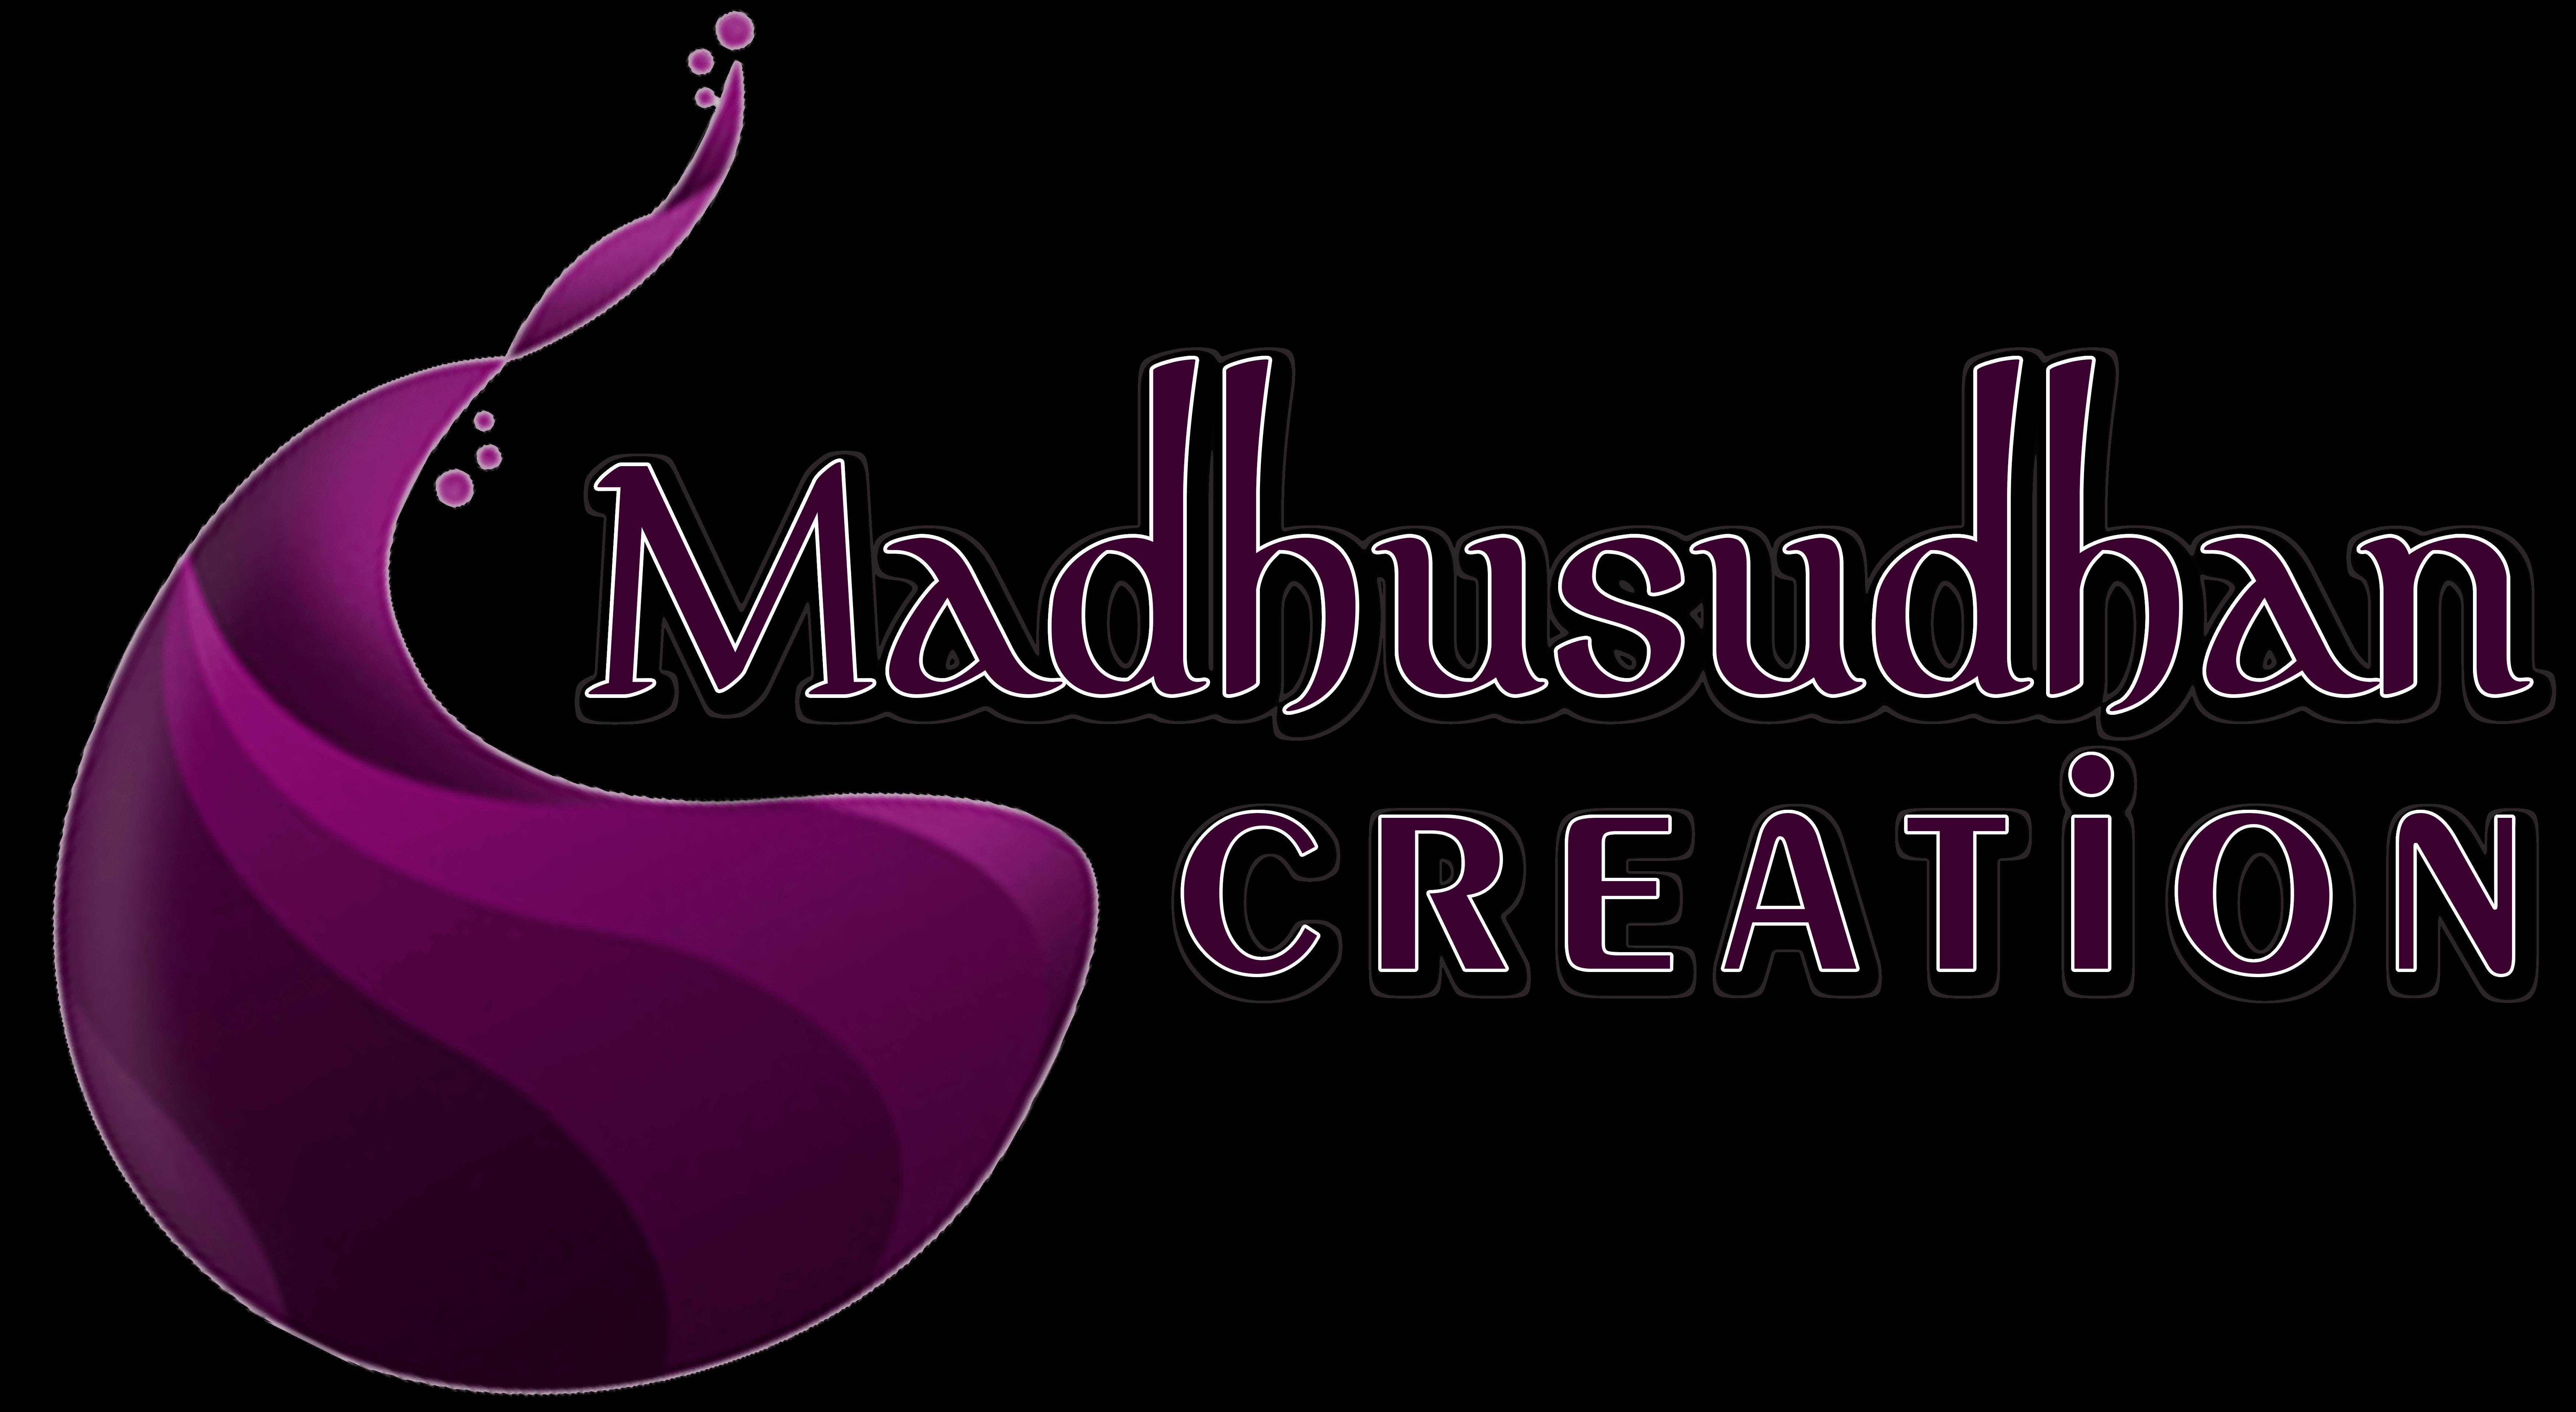 Madhusudhan Creation